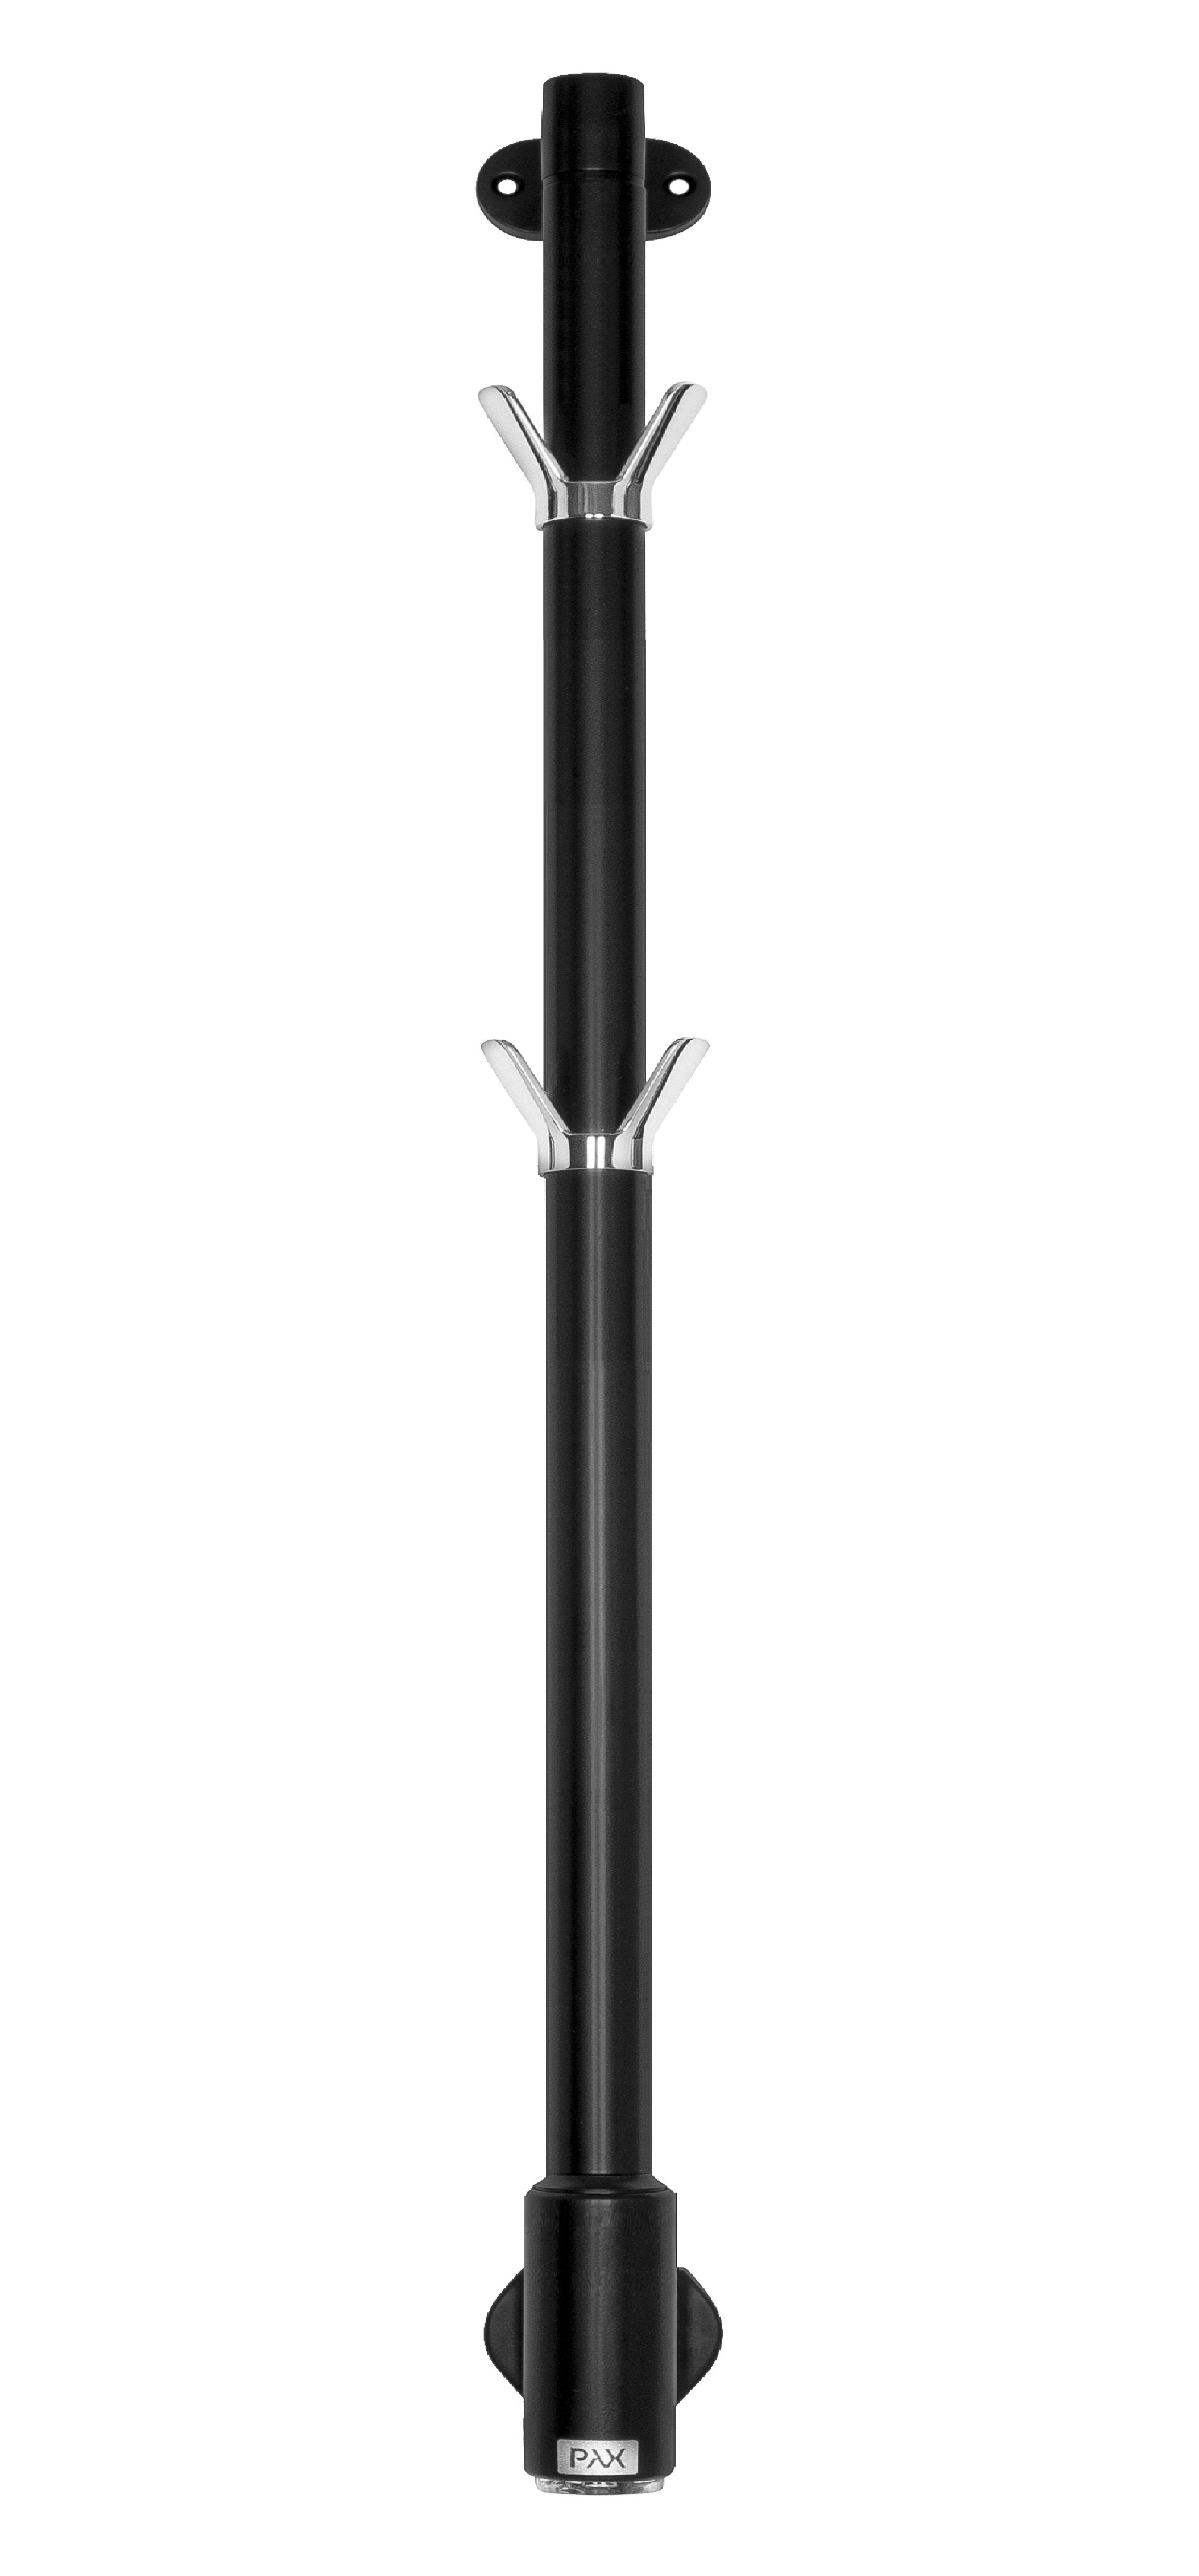 Pax Limbo